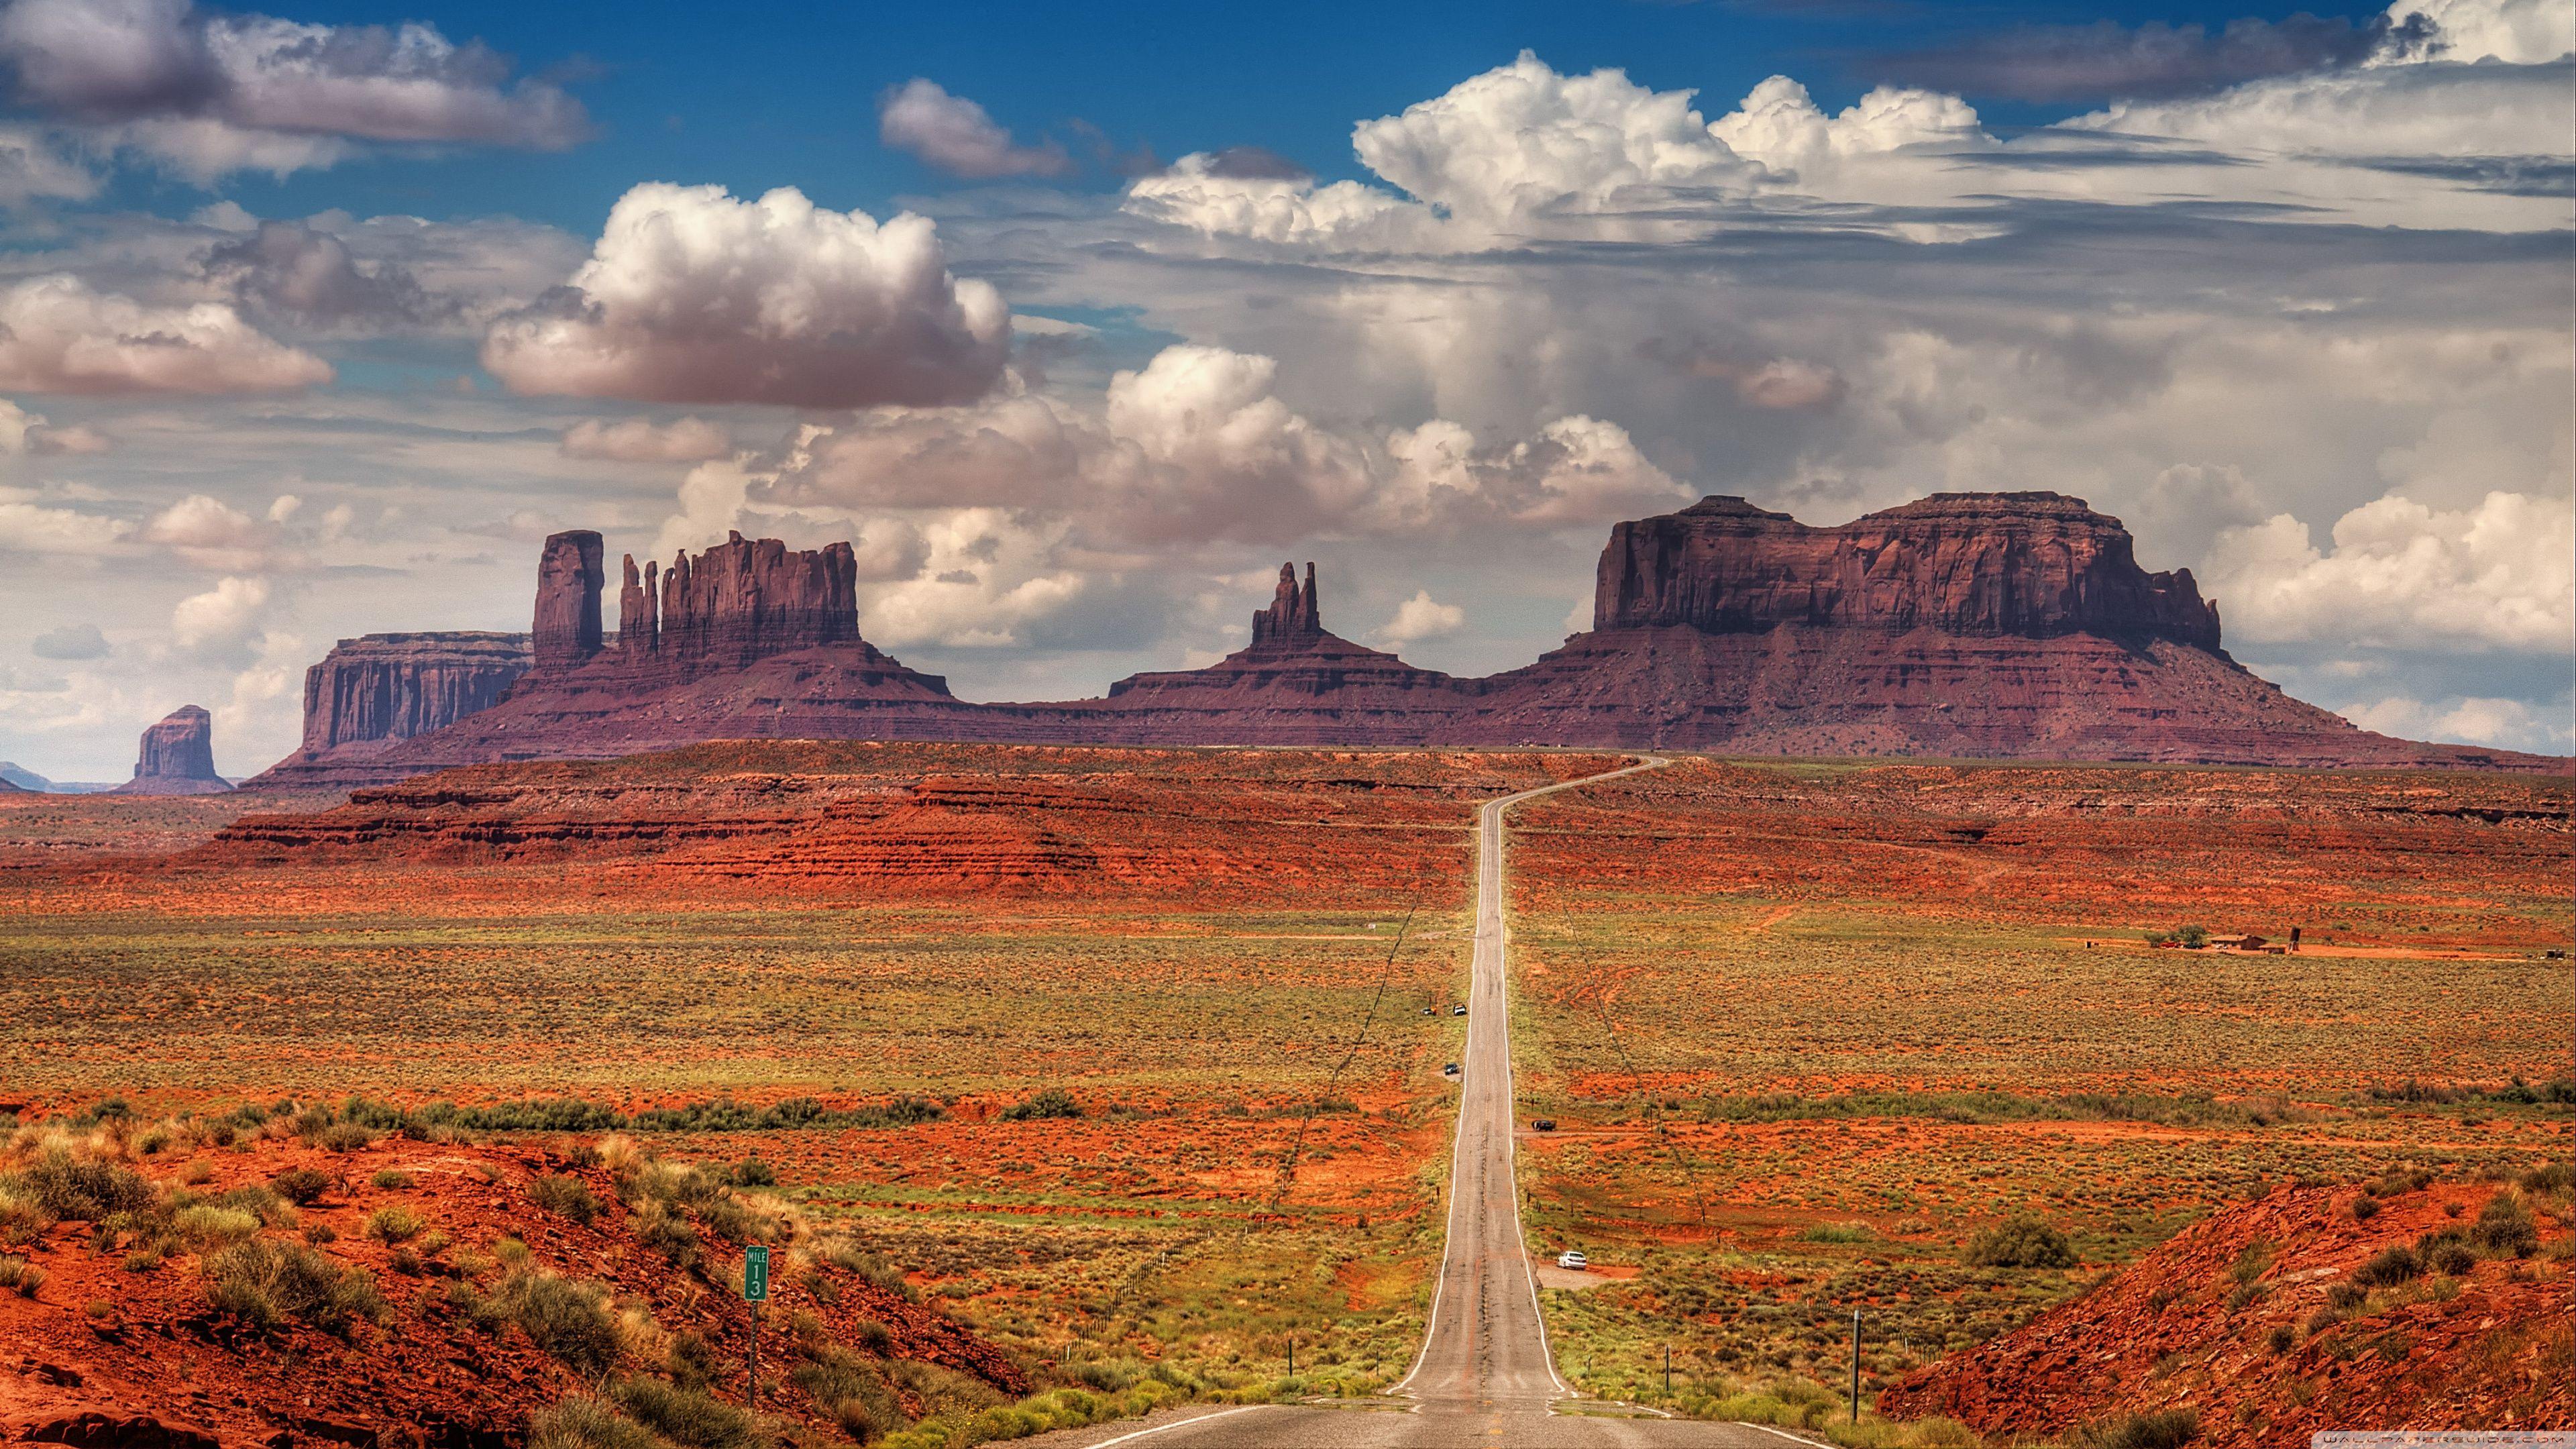 Desert Landscape Wallpapers Top Free Desert Landscape Backgrounds Wallpaperaccess